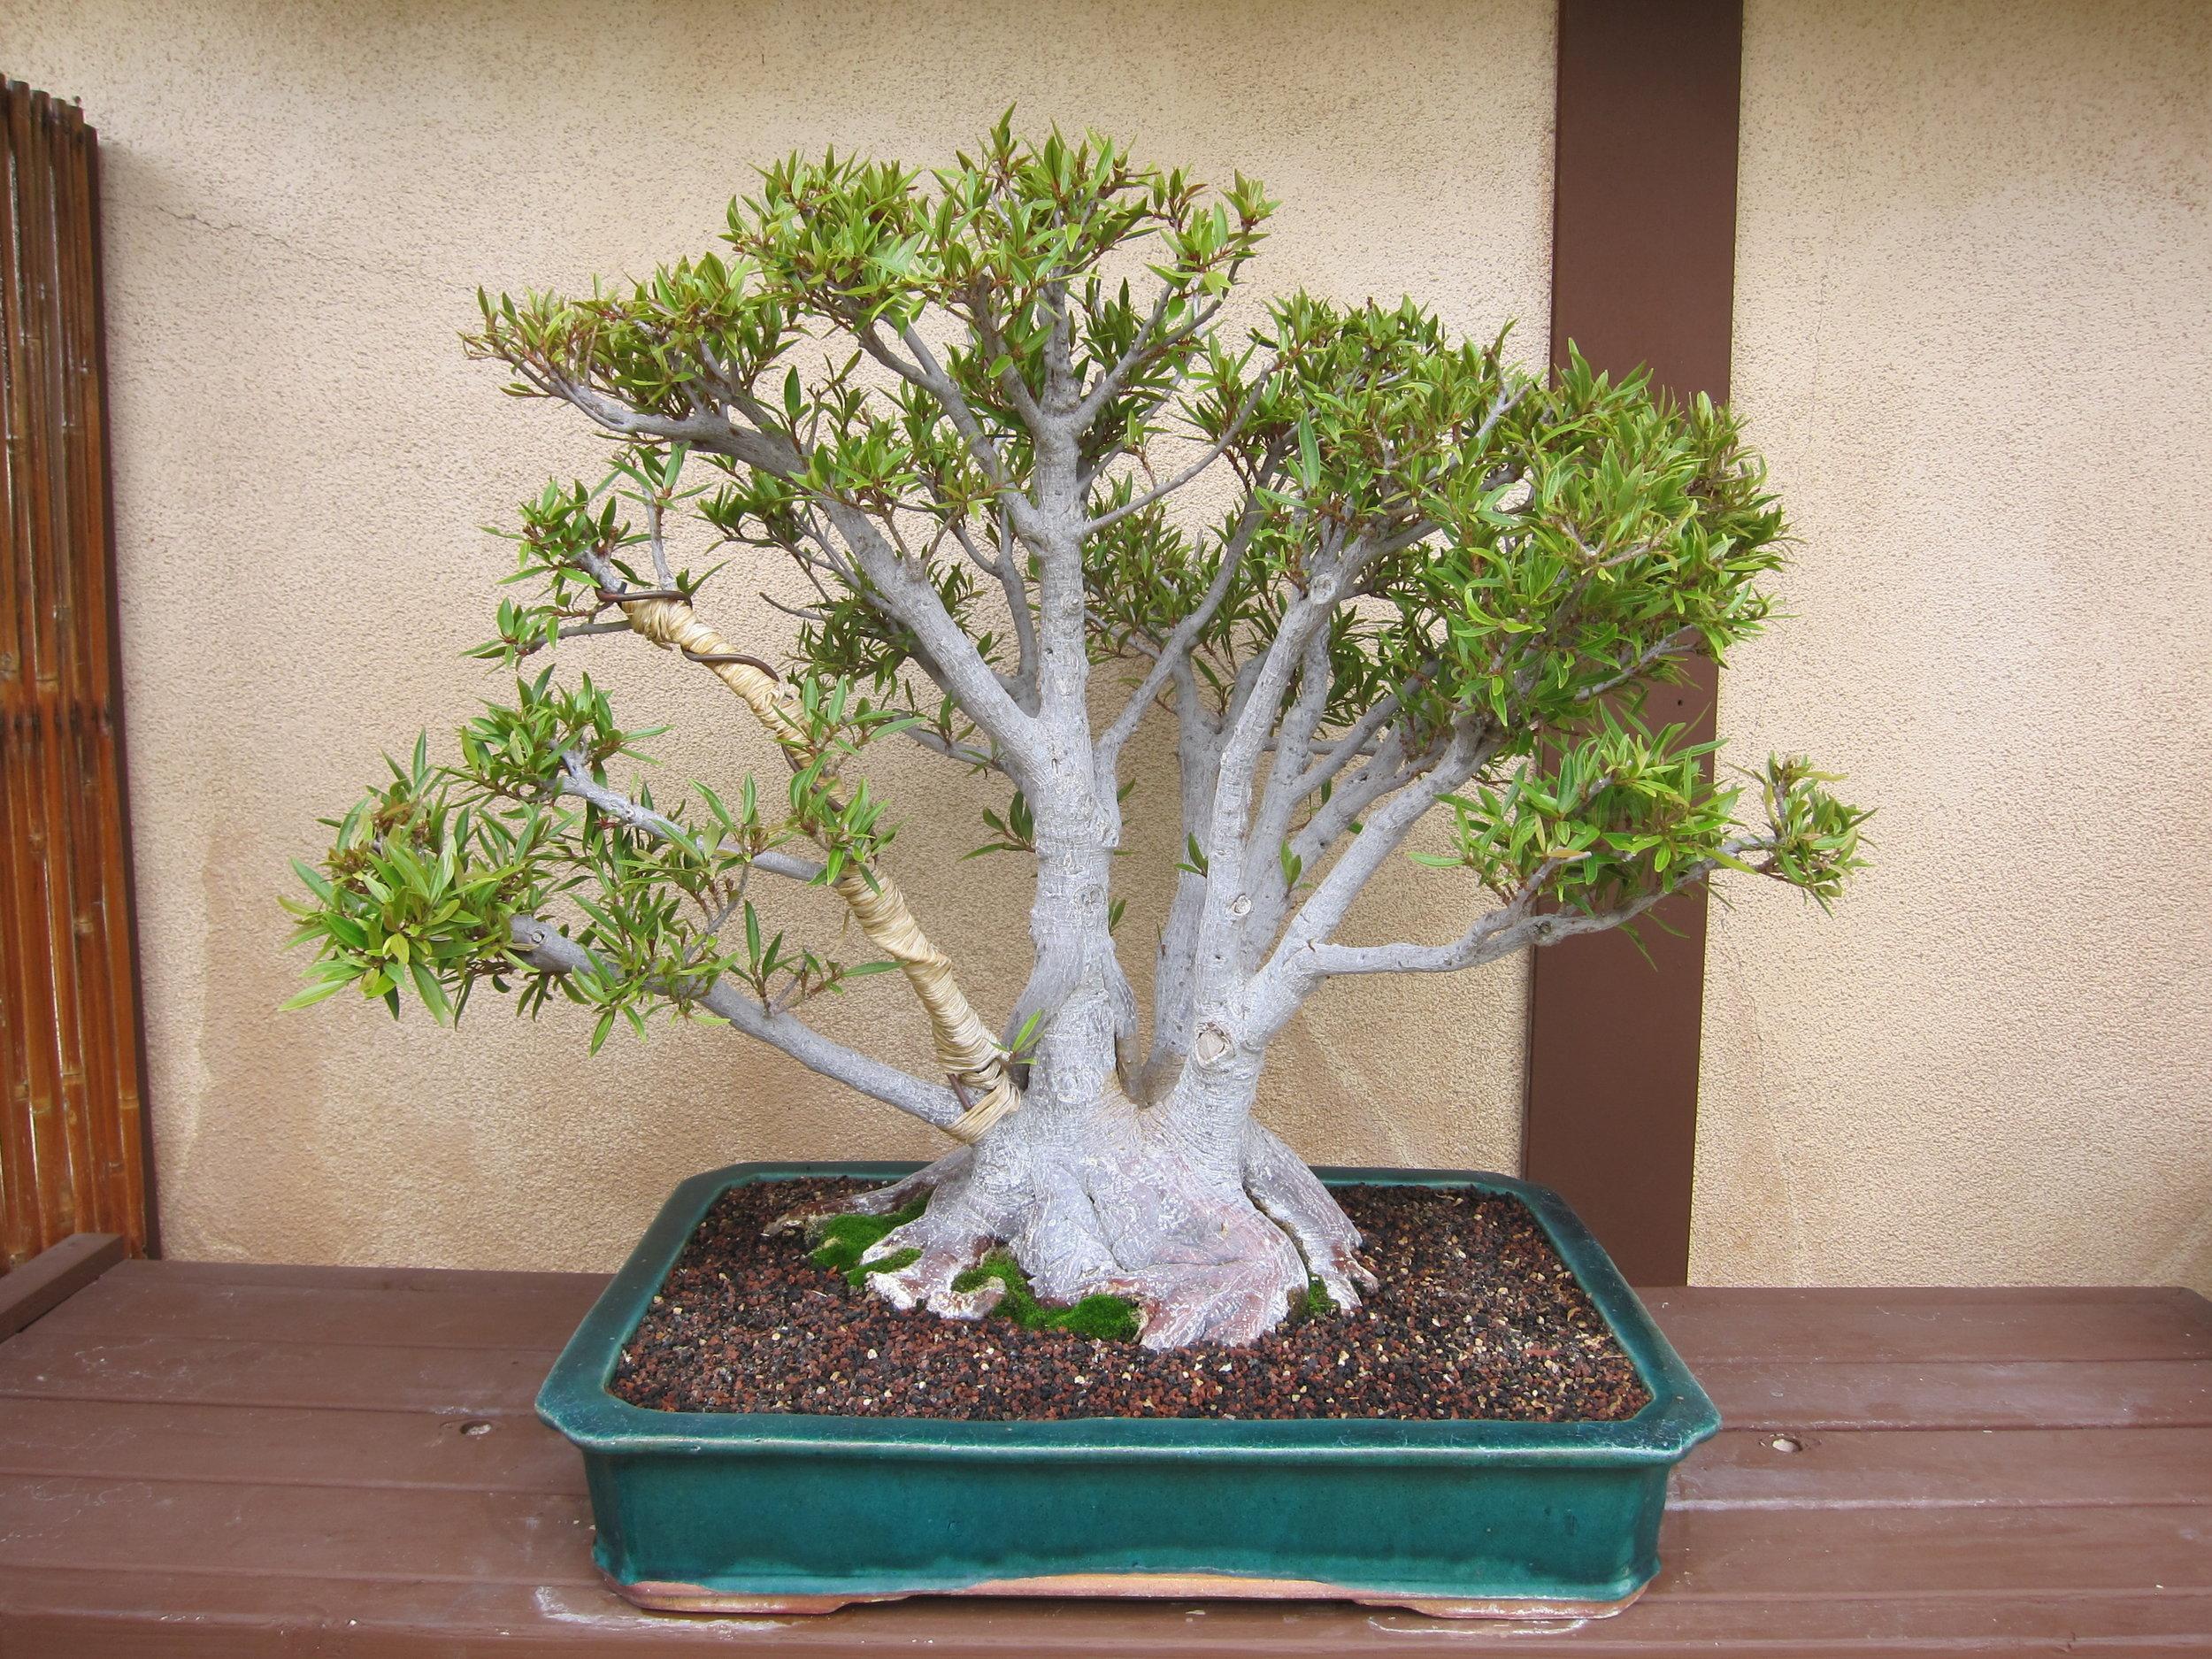 2. Willow Leaf Ficus